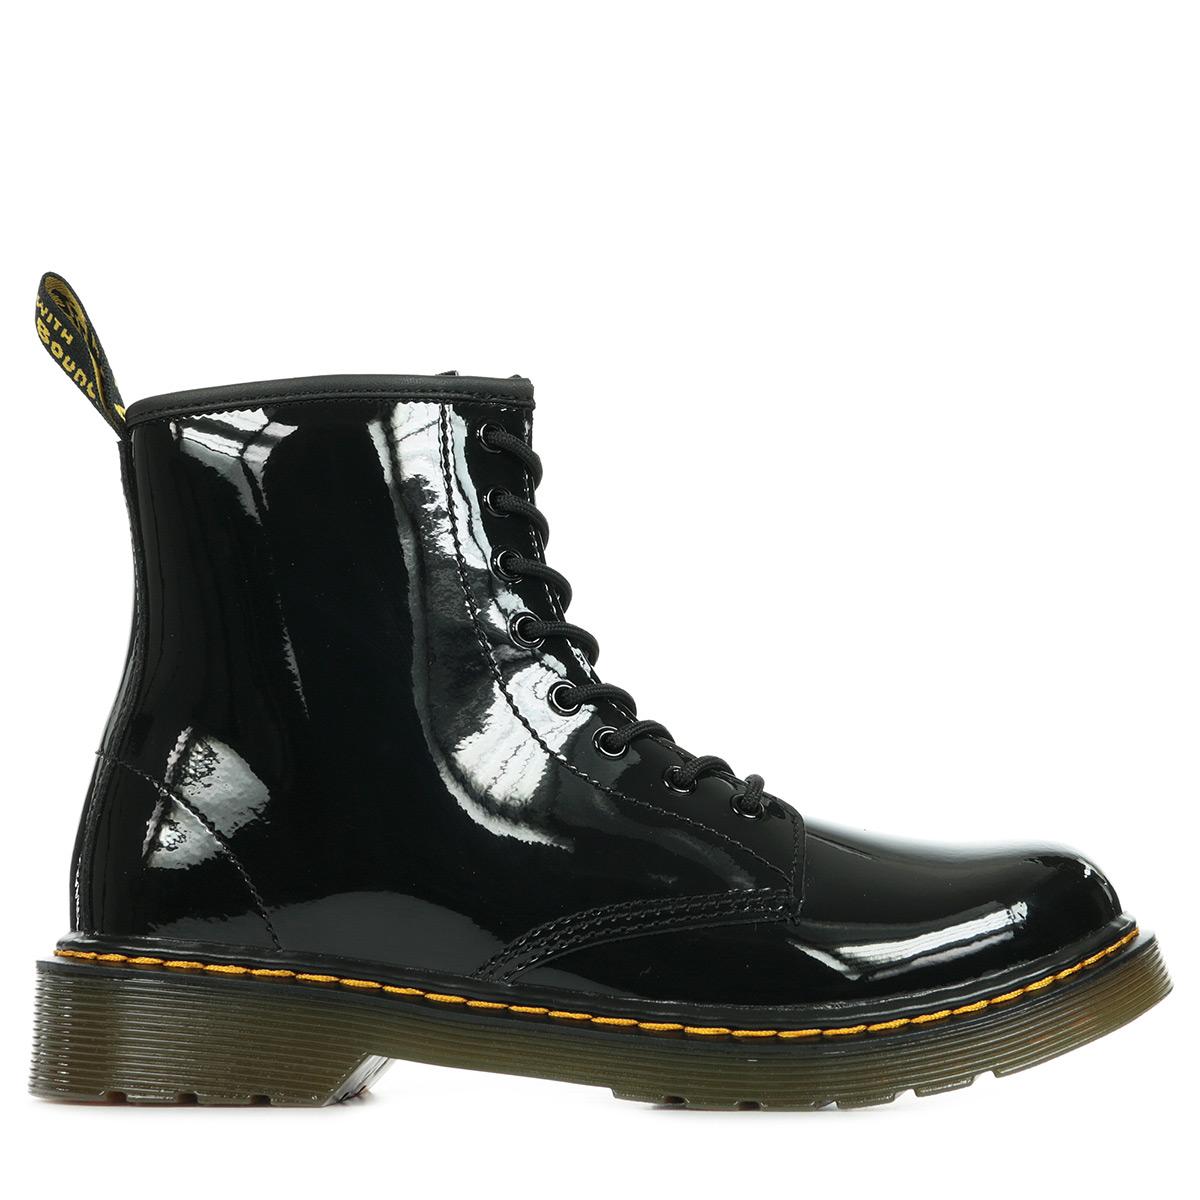 DrMartens De Guide Des Tailles Chaussures 0OnwPkNX8